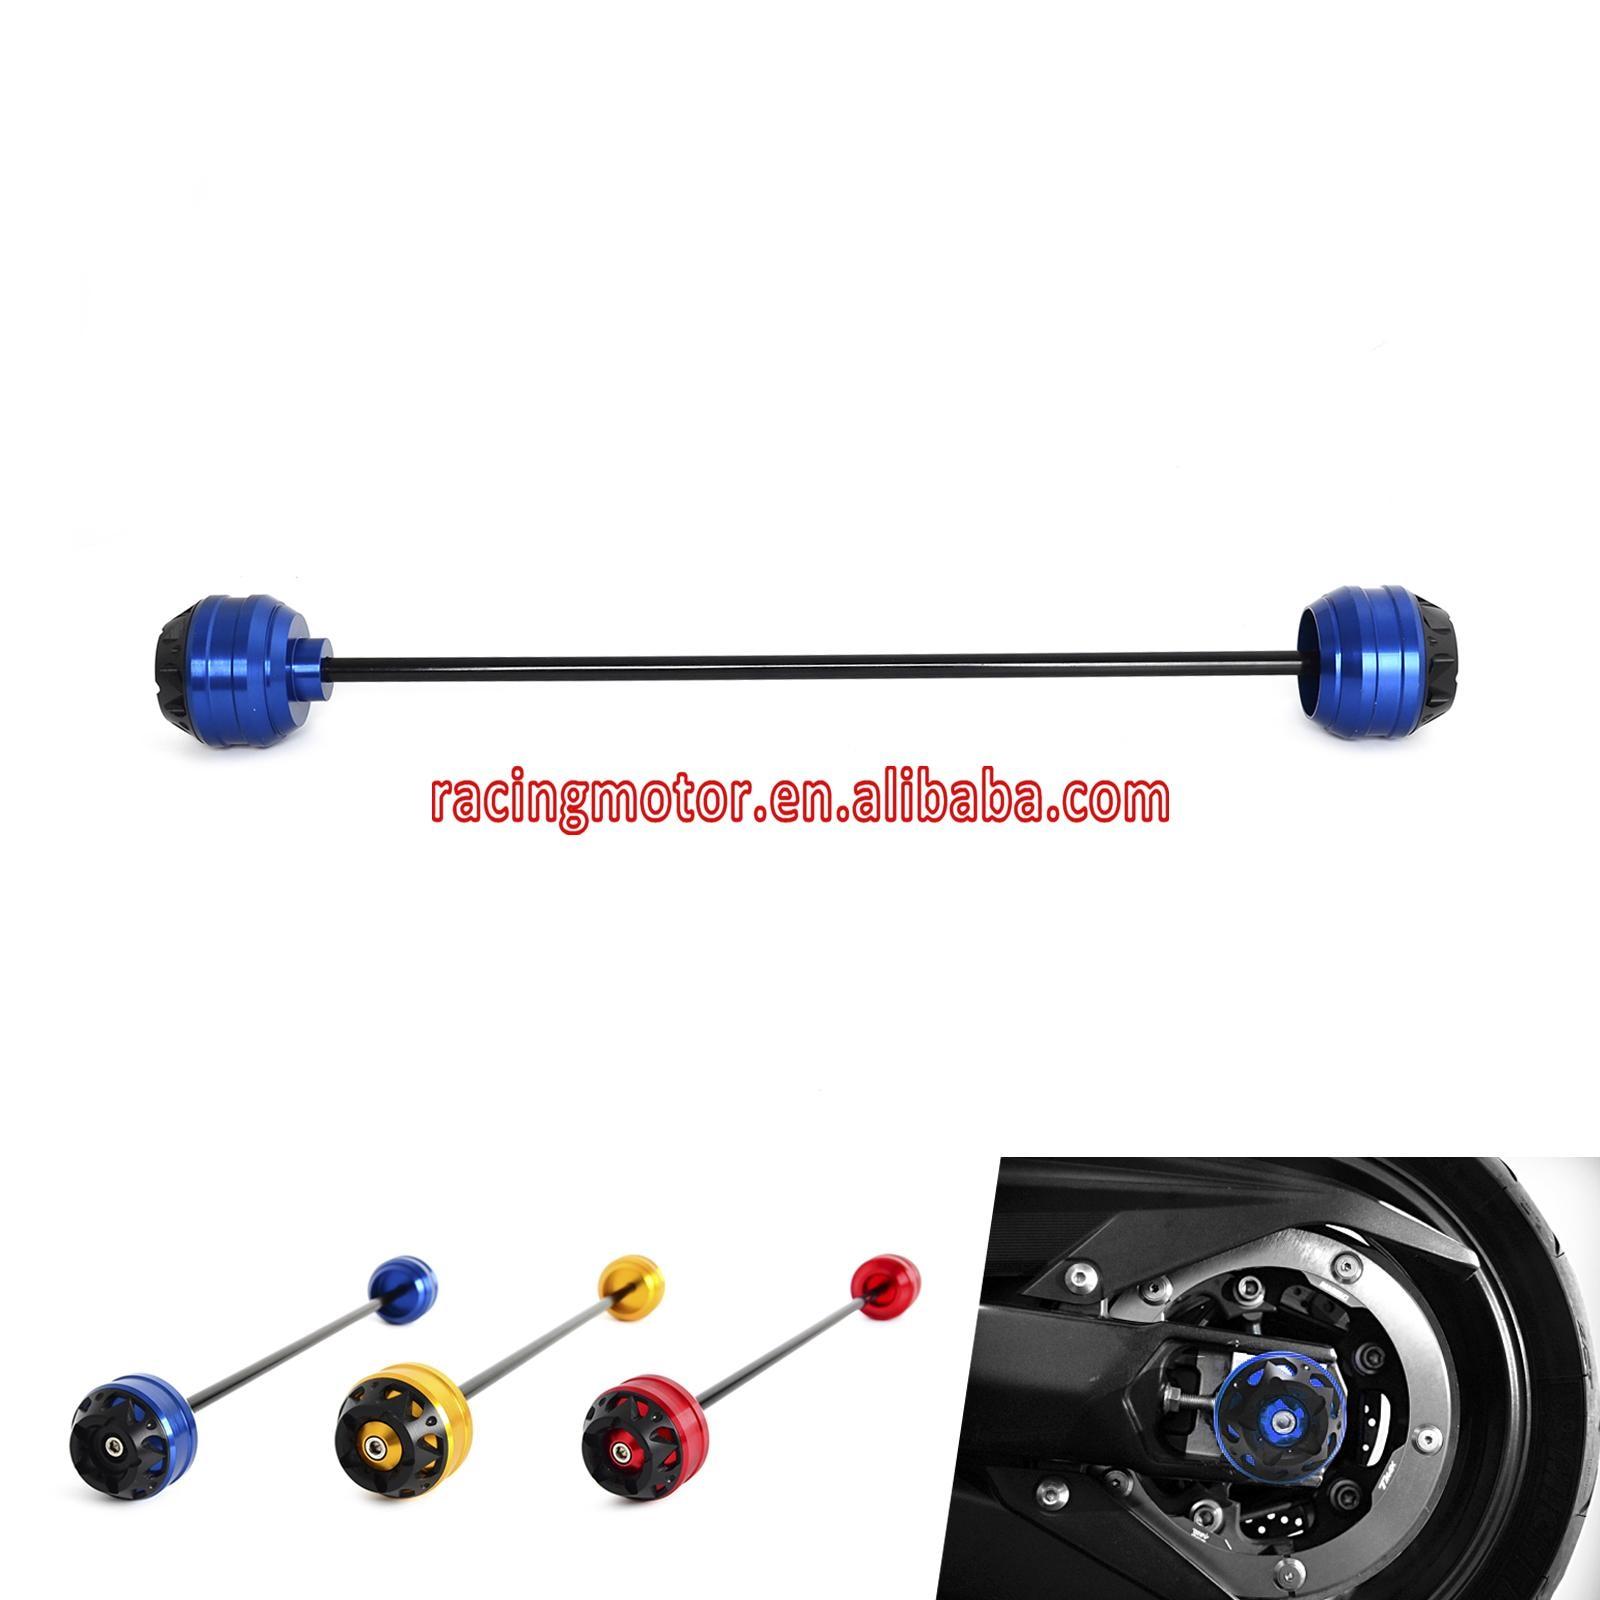 ФОТО Rear CNC Wheel Axle Fork Crash Protector Slider For T-MAX 500 XP500 2008-2011 XP530 2012-2016